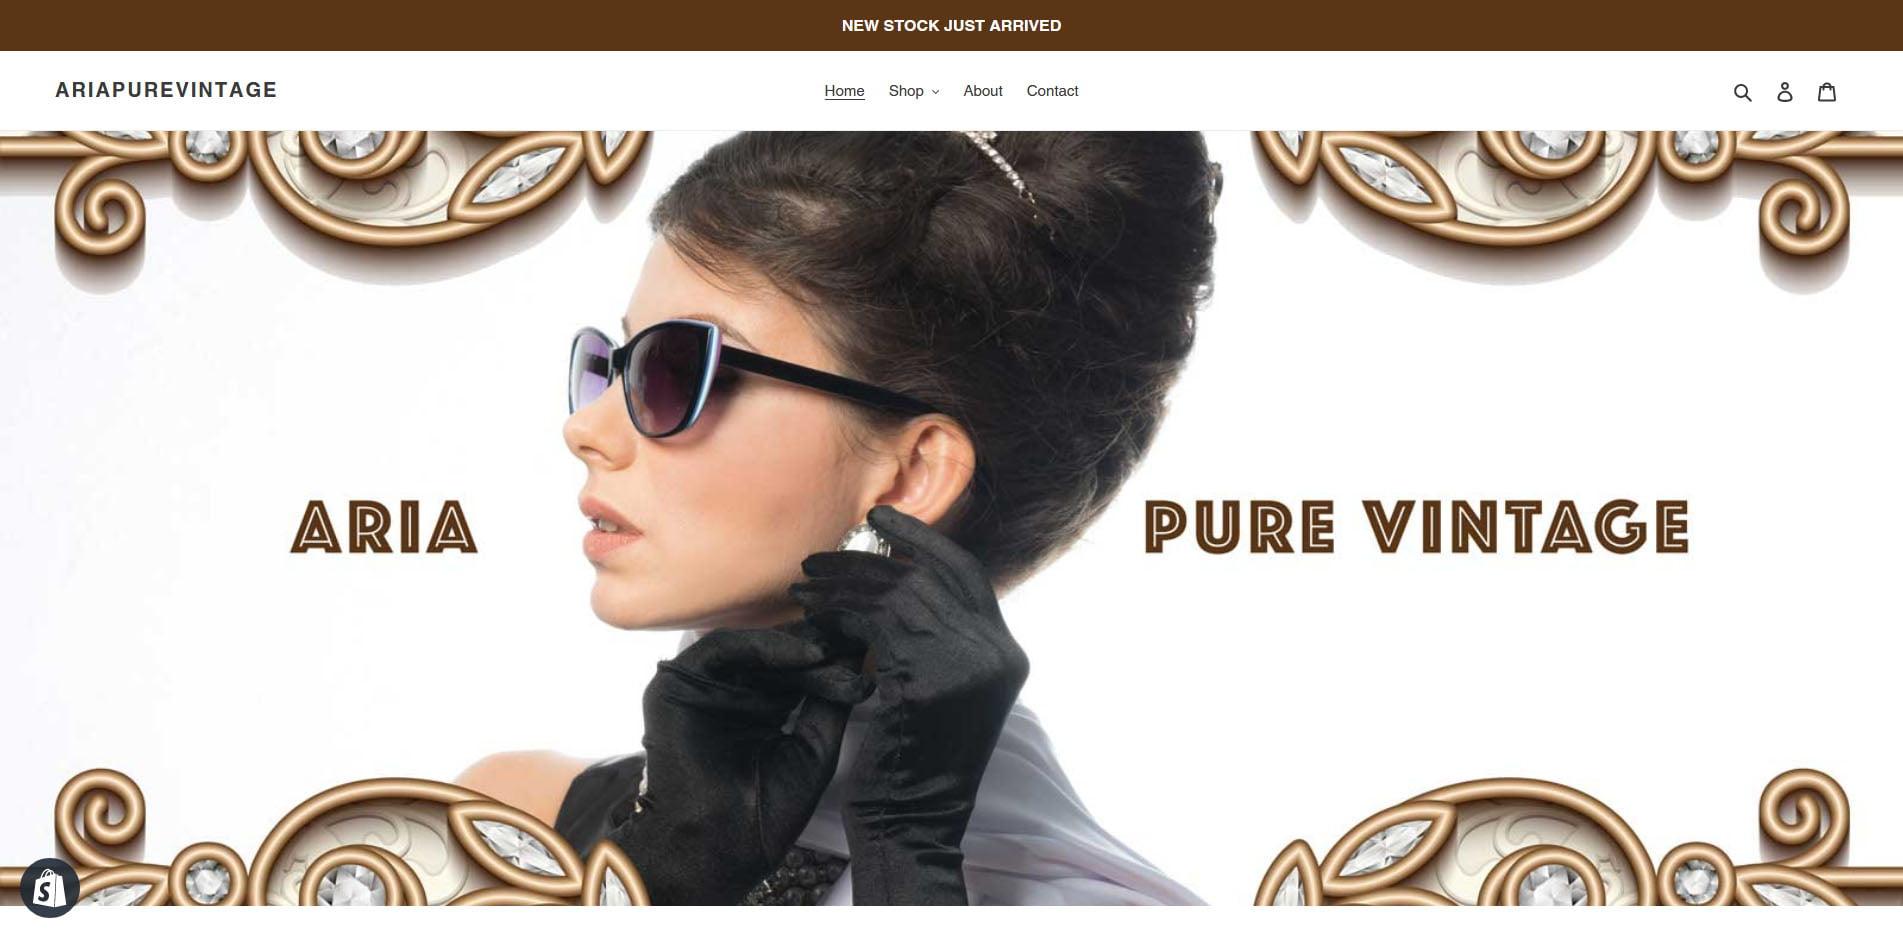 Aria Pure Vintage